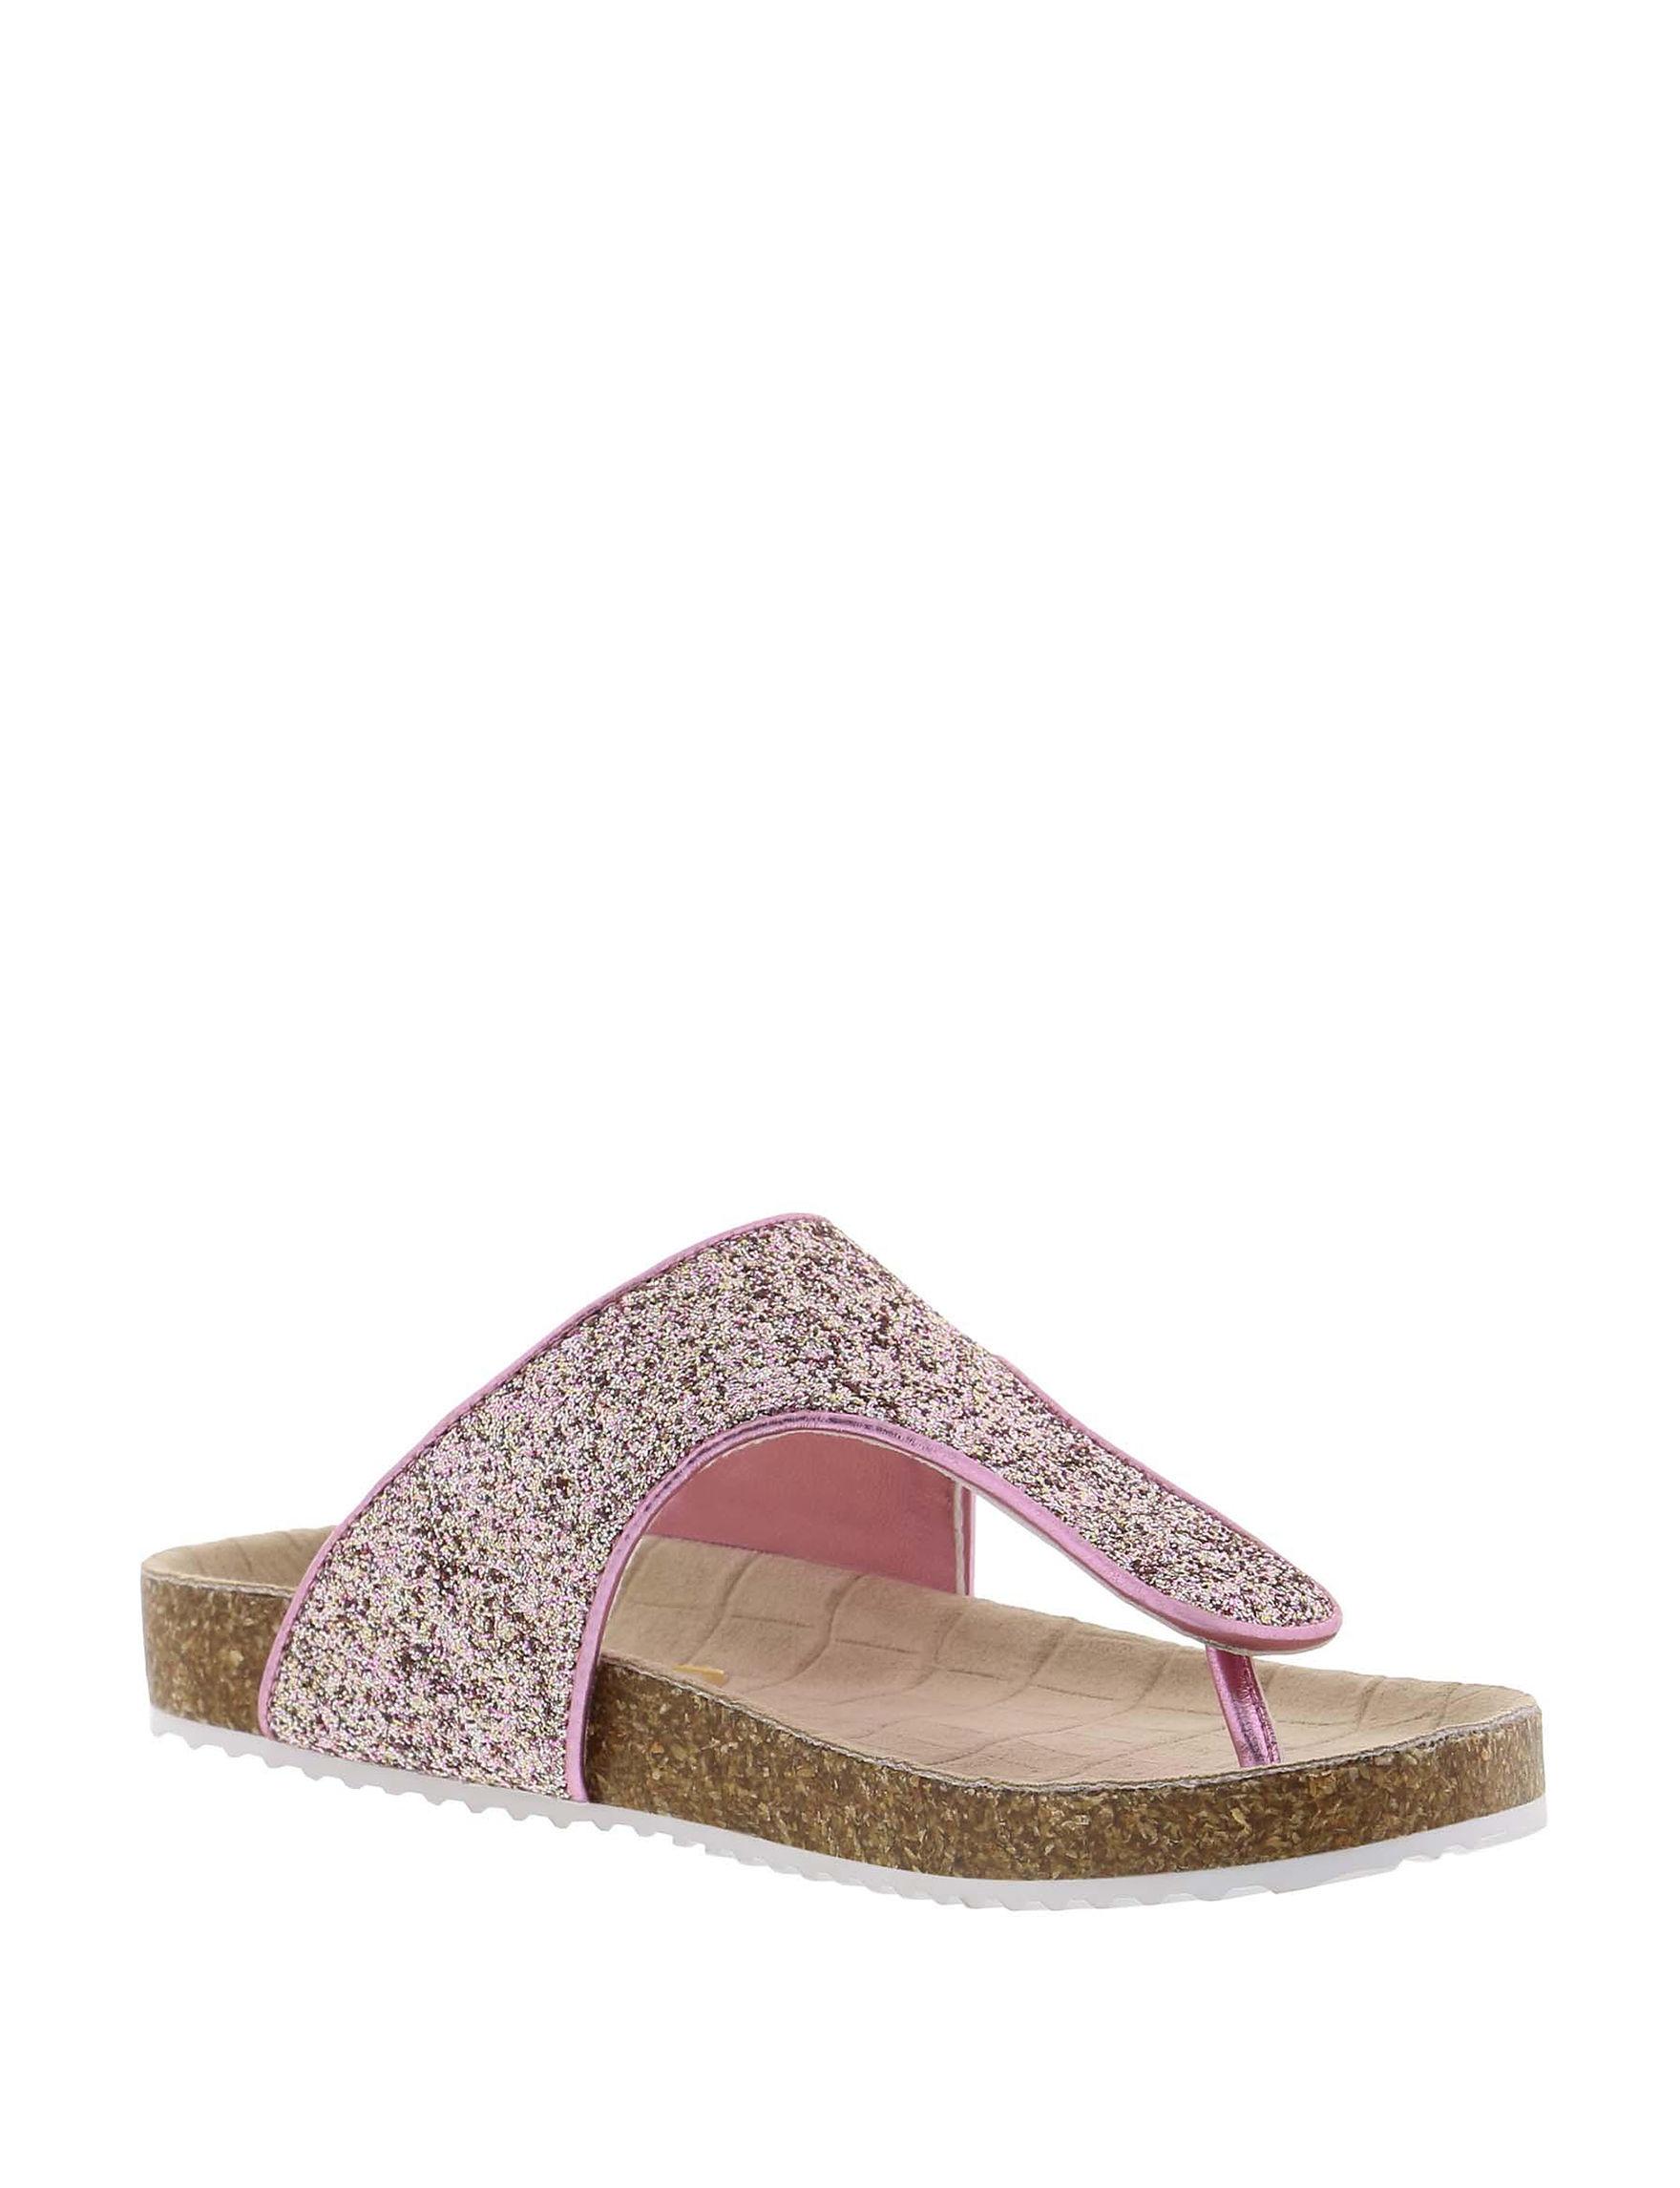 Circus By Sam Edelman Pink Flat Sandals